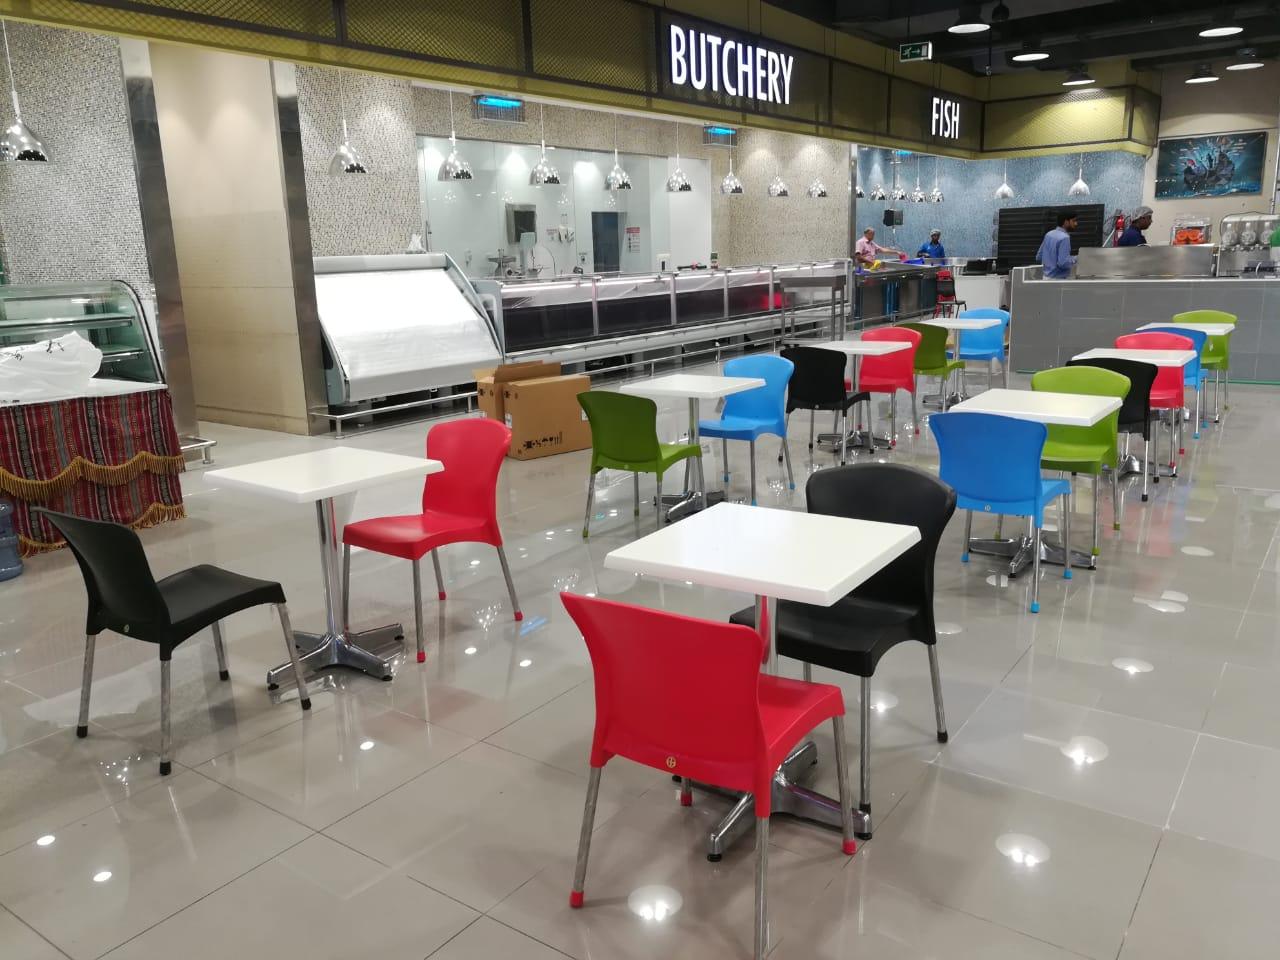 food court furniture in supermarket